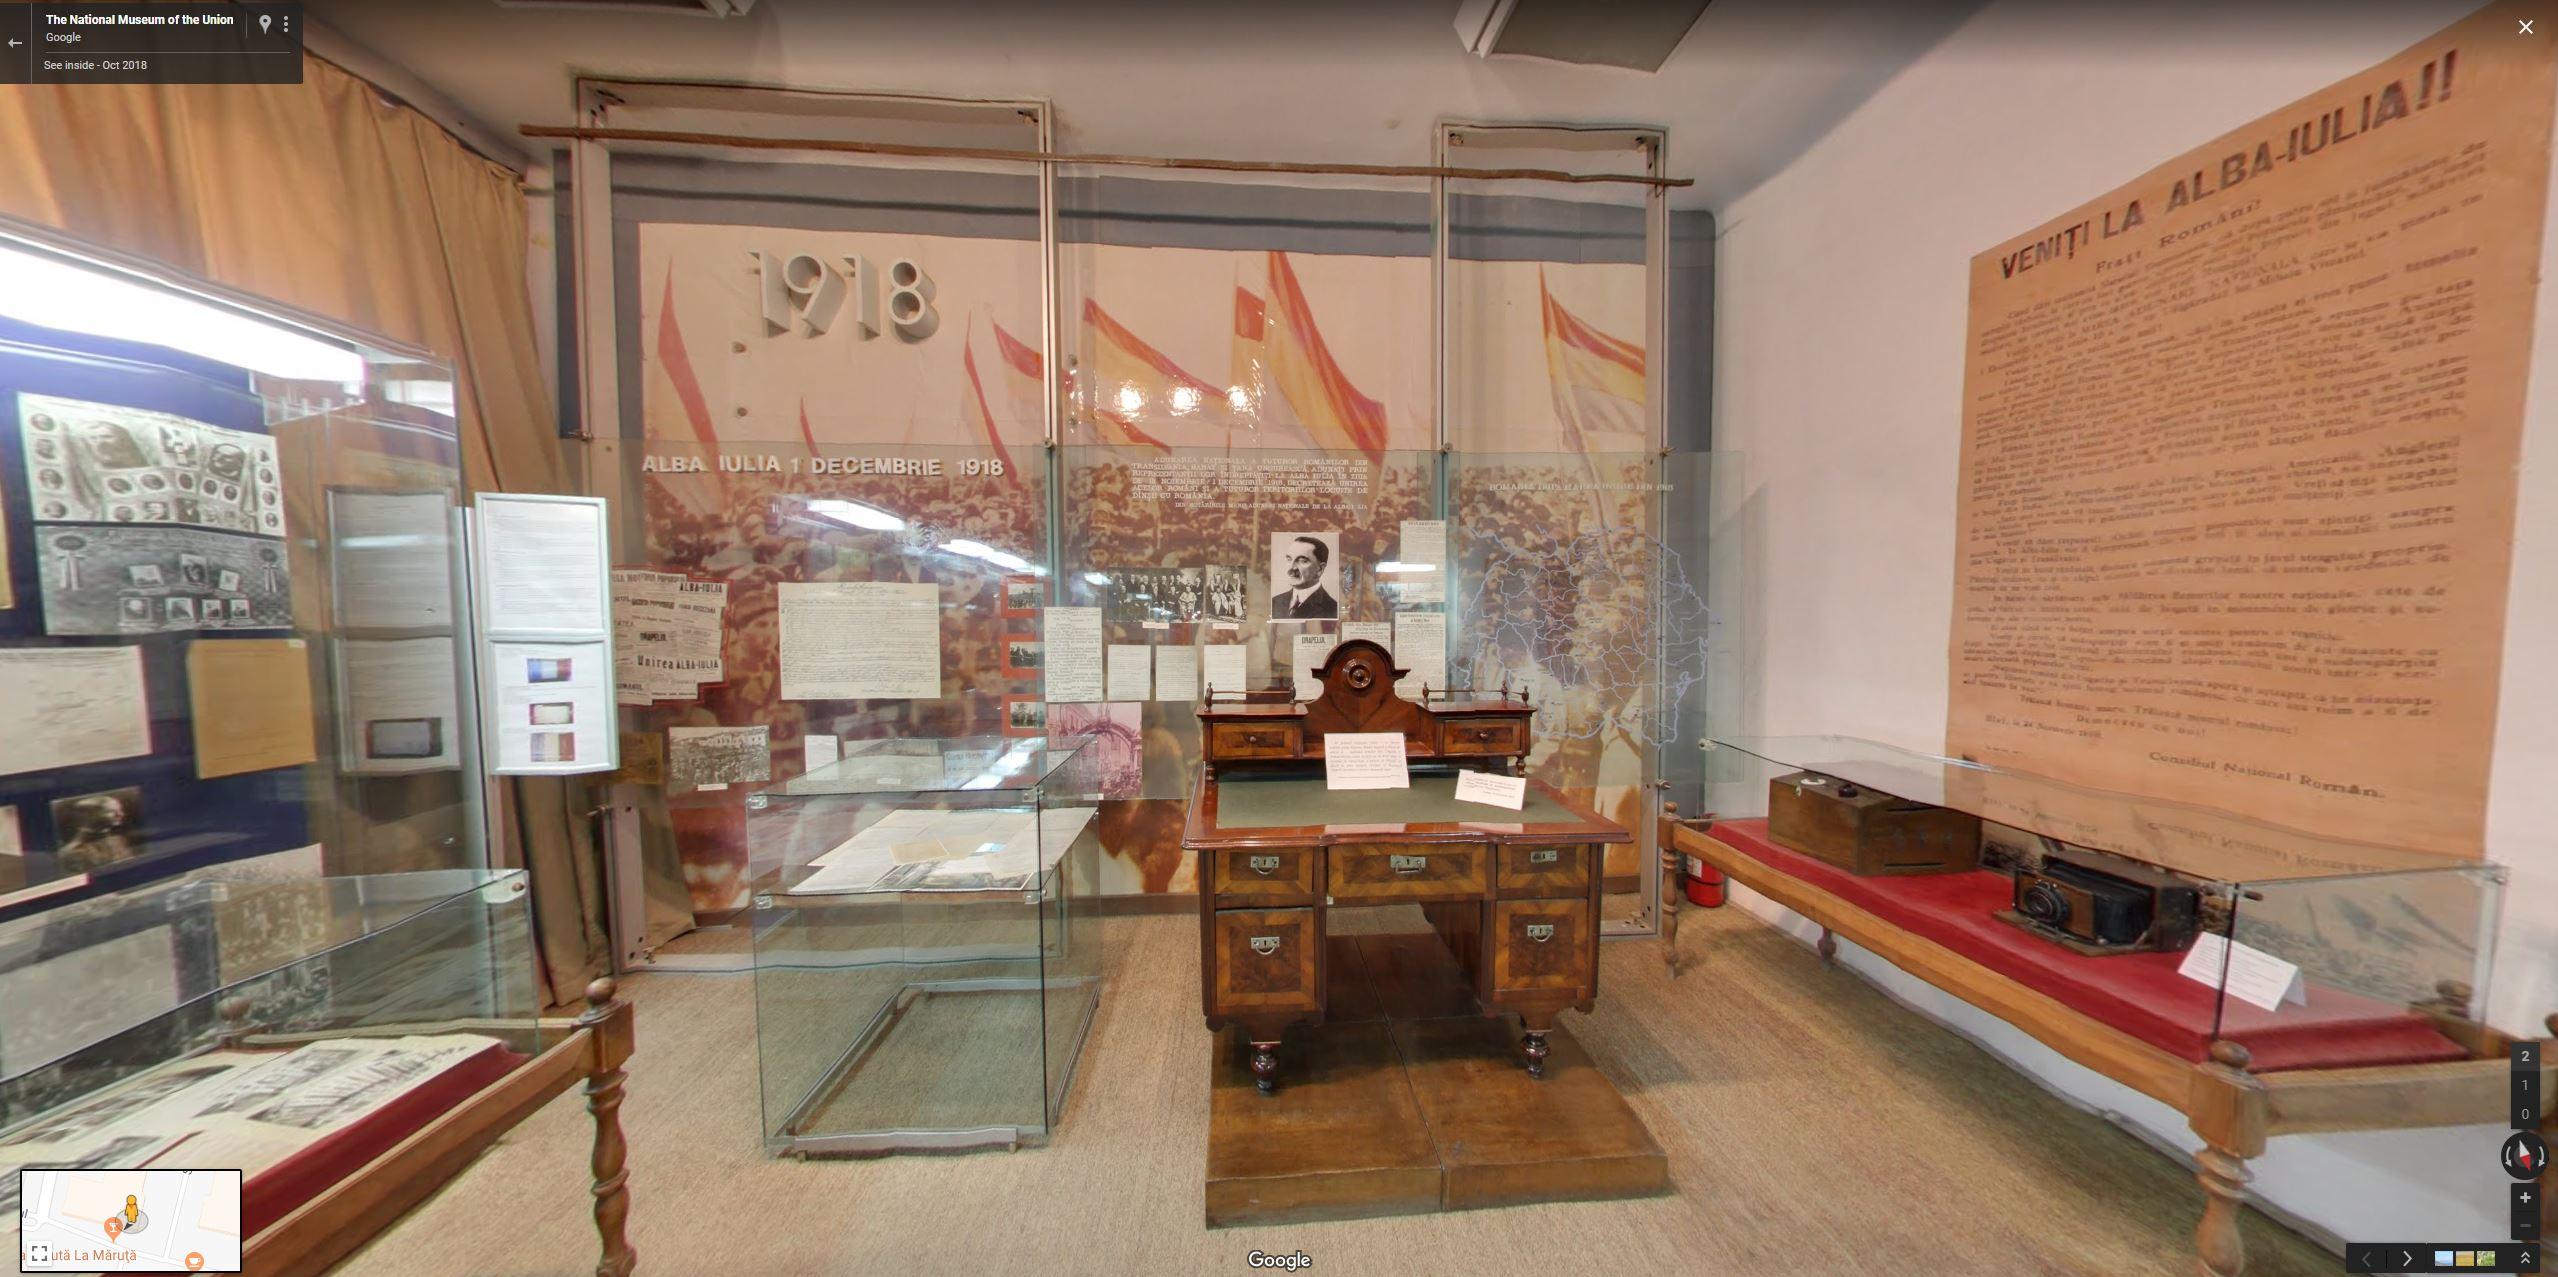 google imagini romania Muzeul National al Unirii din Alba Iulia